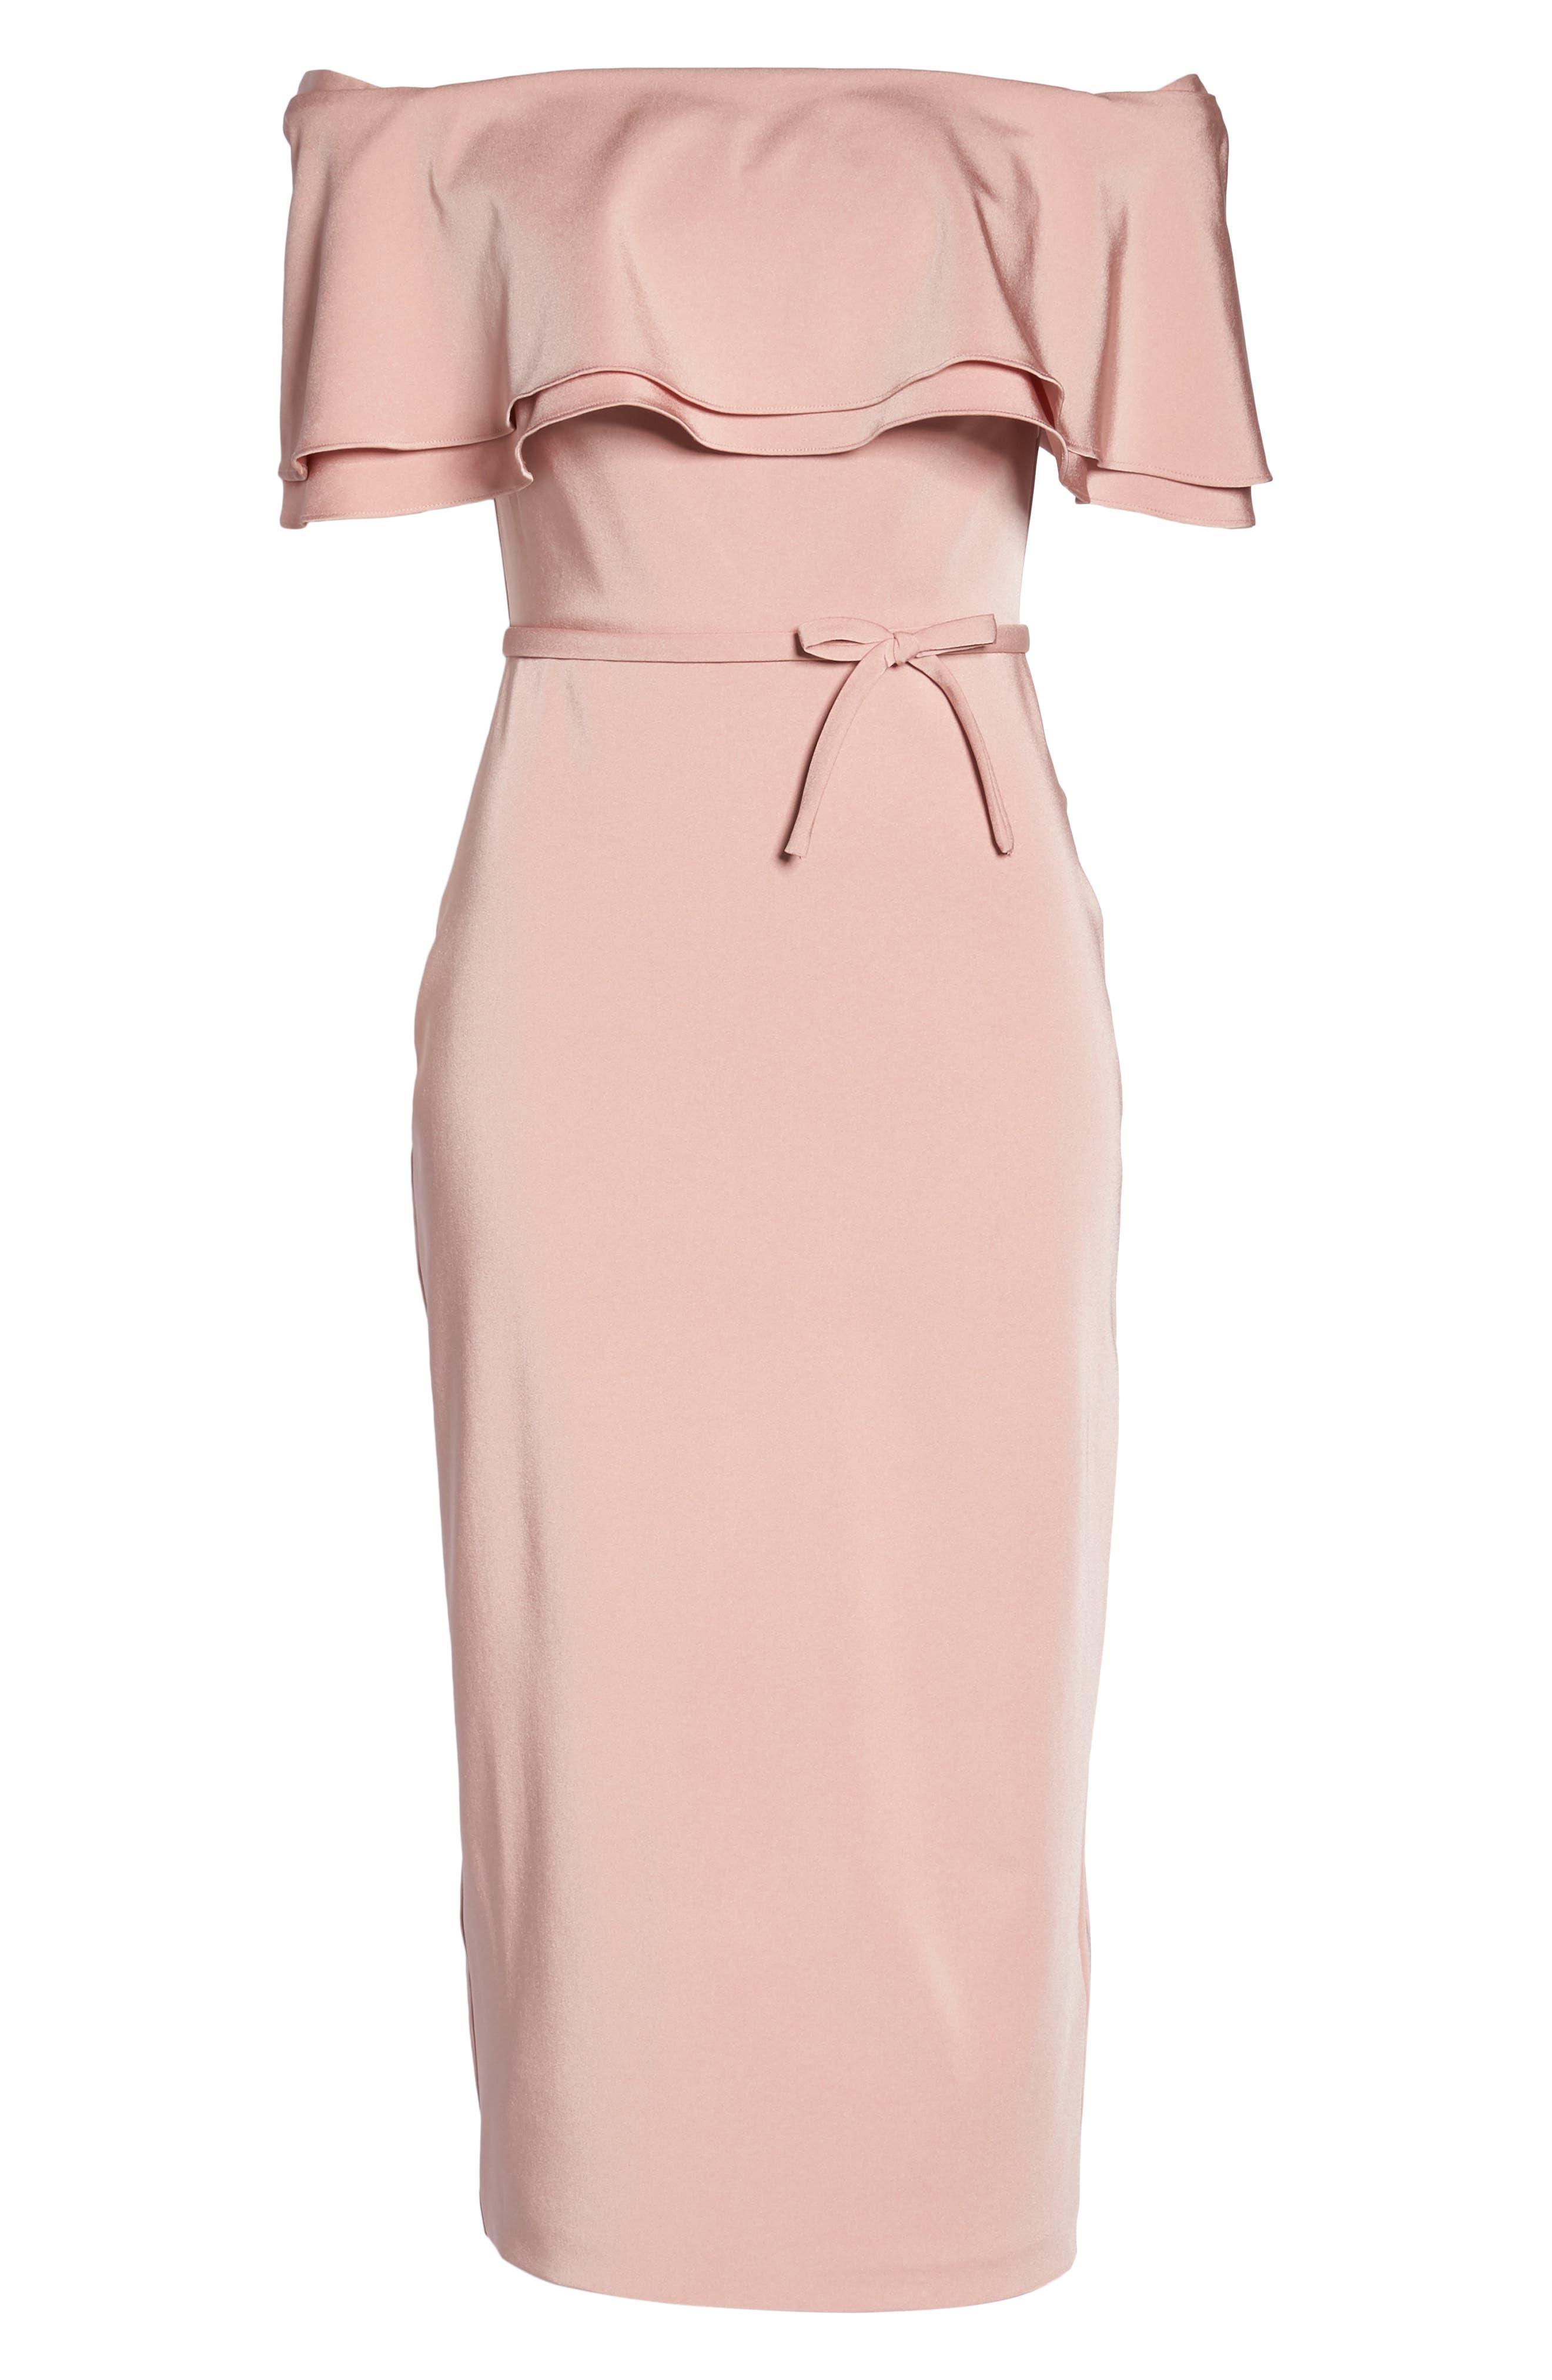 Ruffle Off the Shoulder Tea Length Dress,                             Alternate thumbnail 6, color,                             Rose